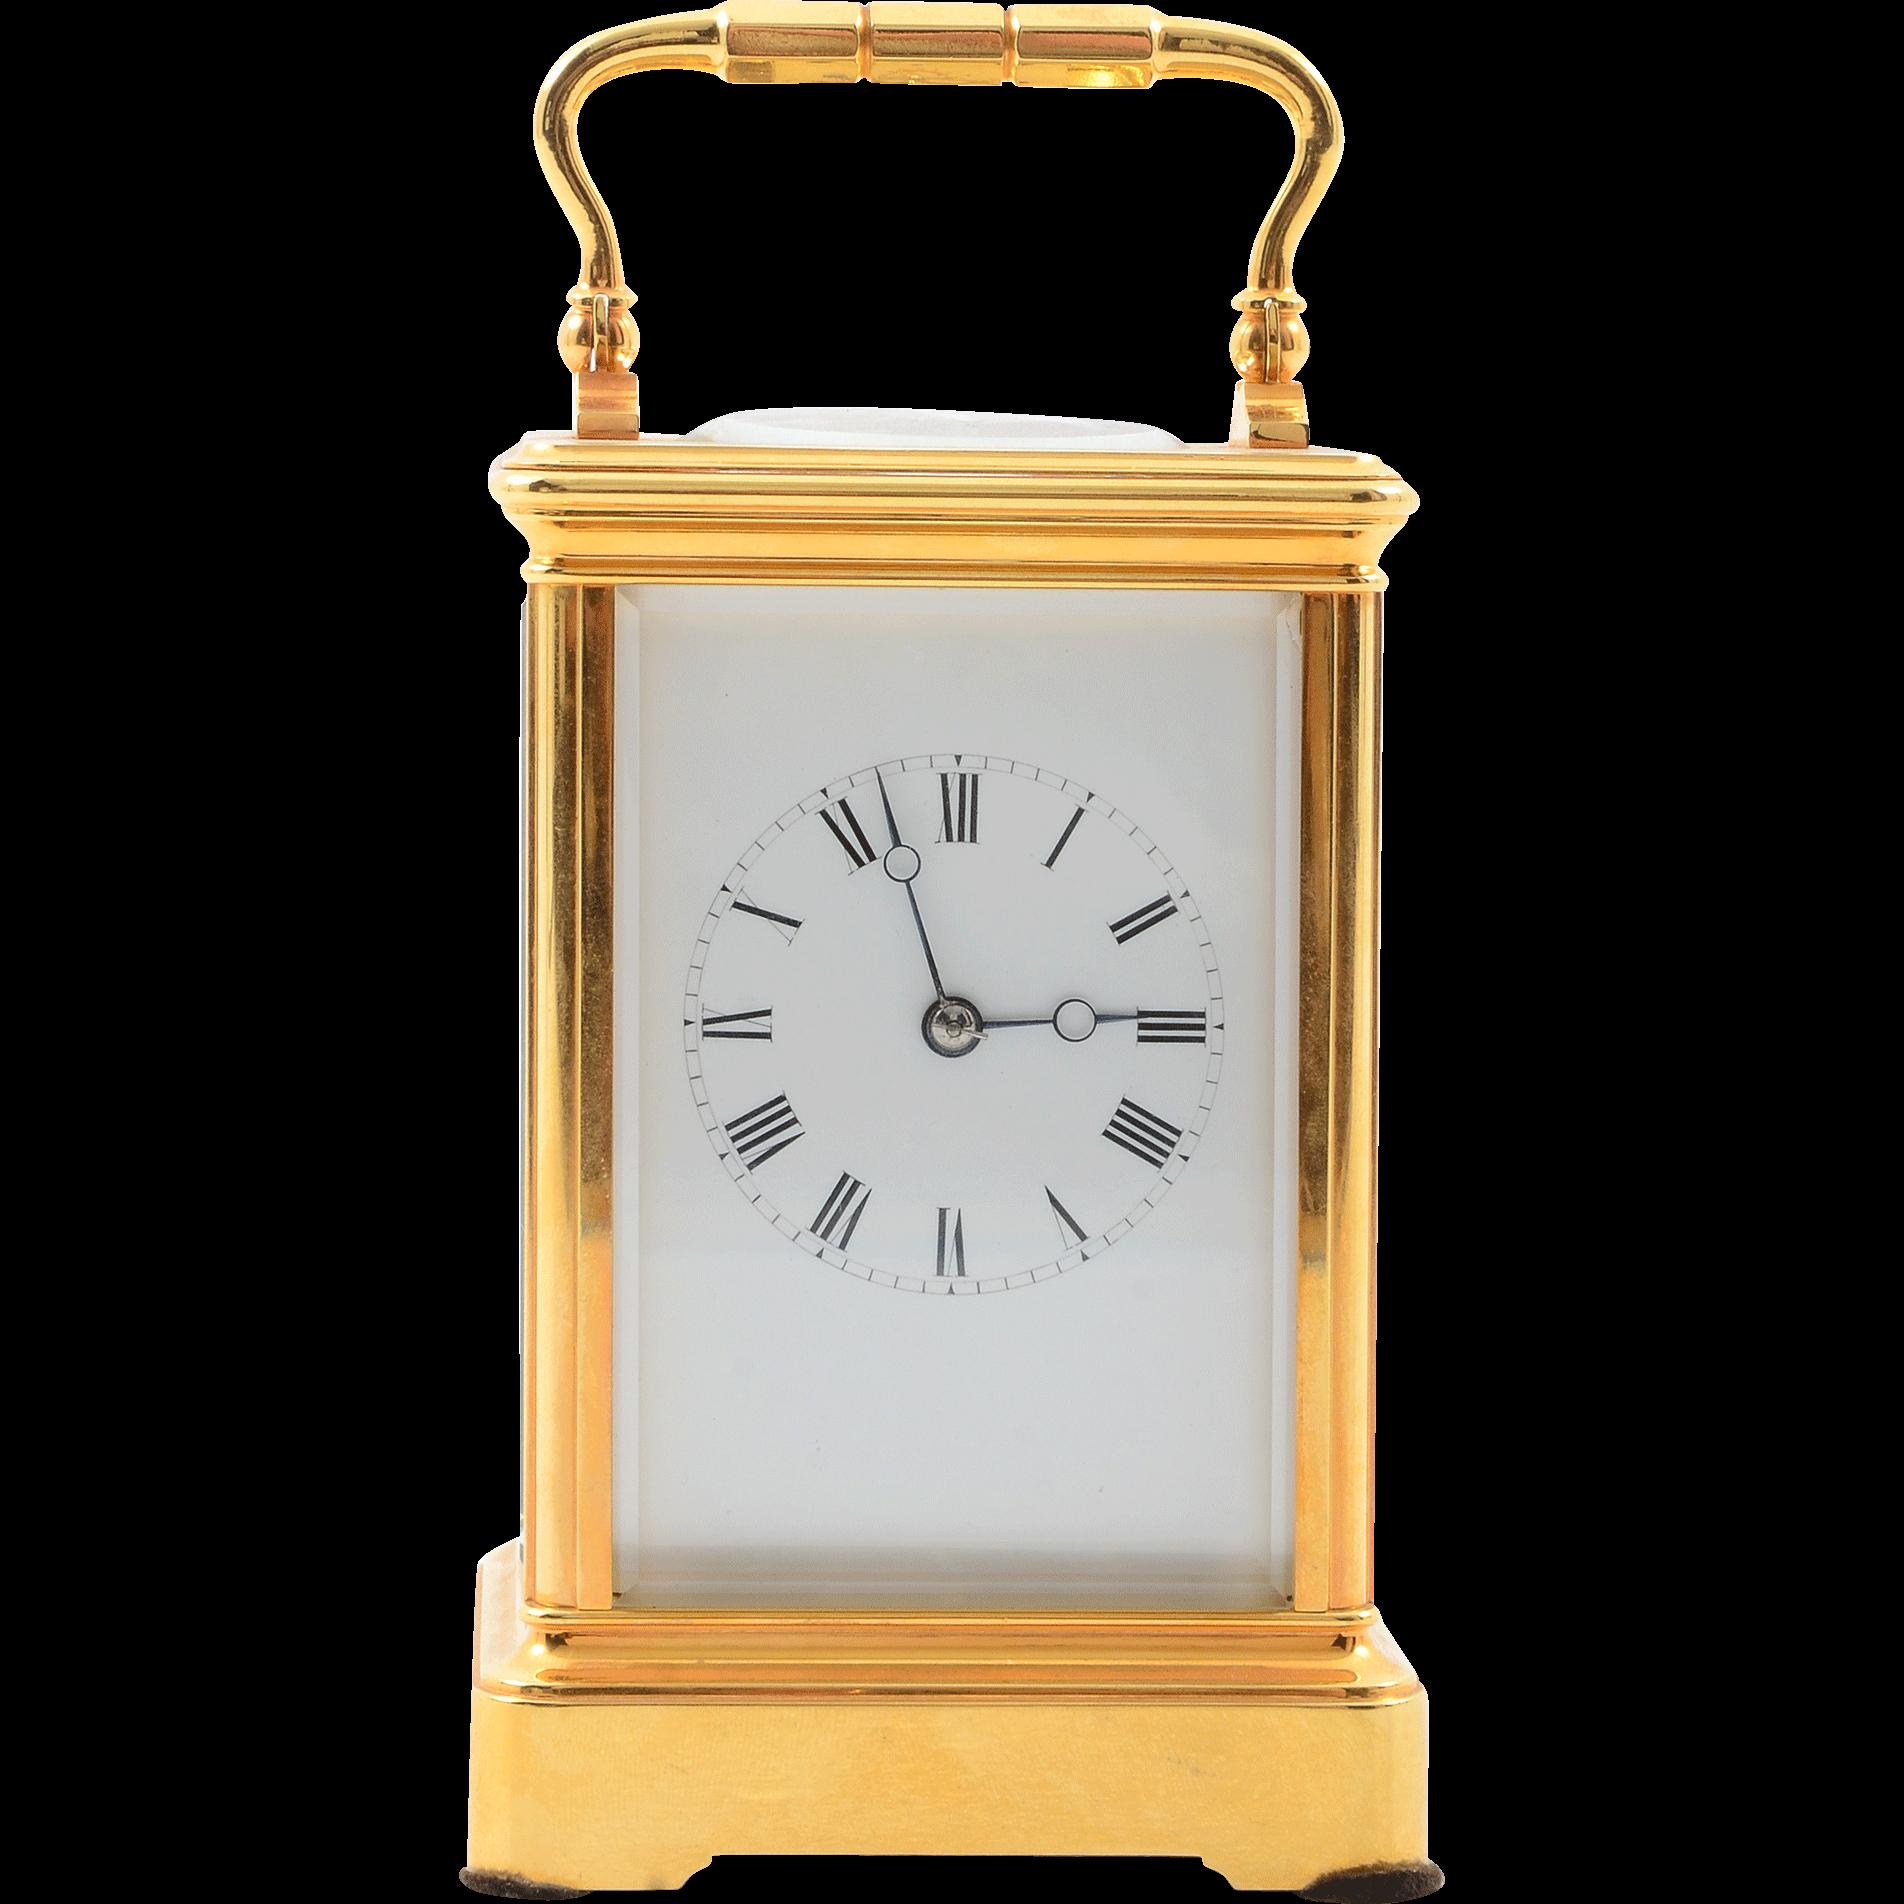 French 18 Karat Gilt Brass Carriage Clock by Soldano of Paris